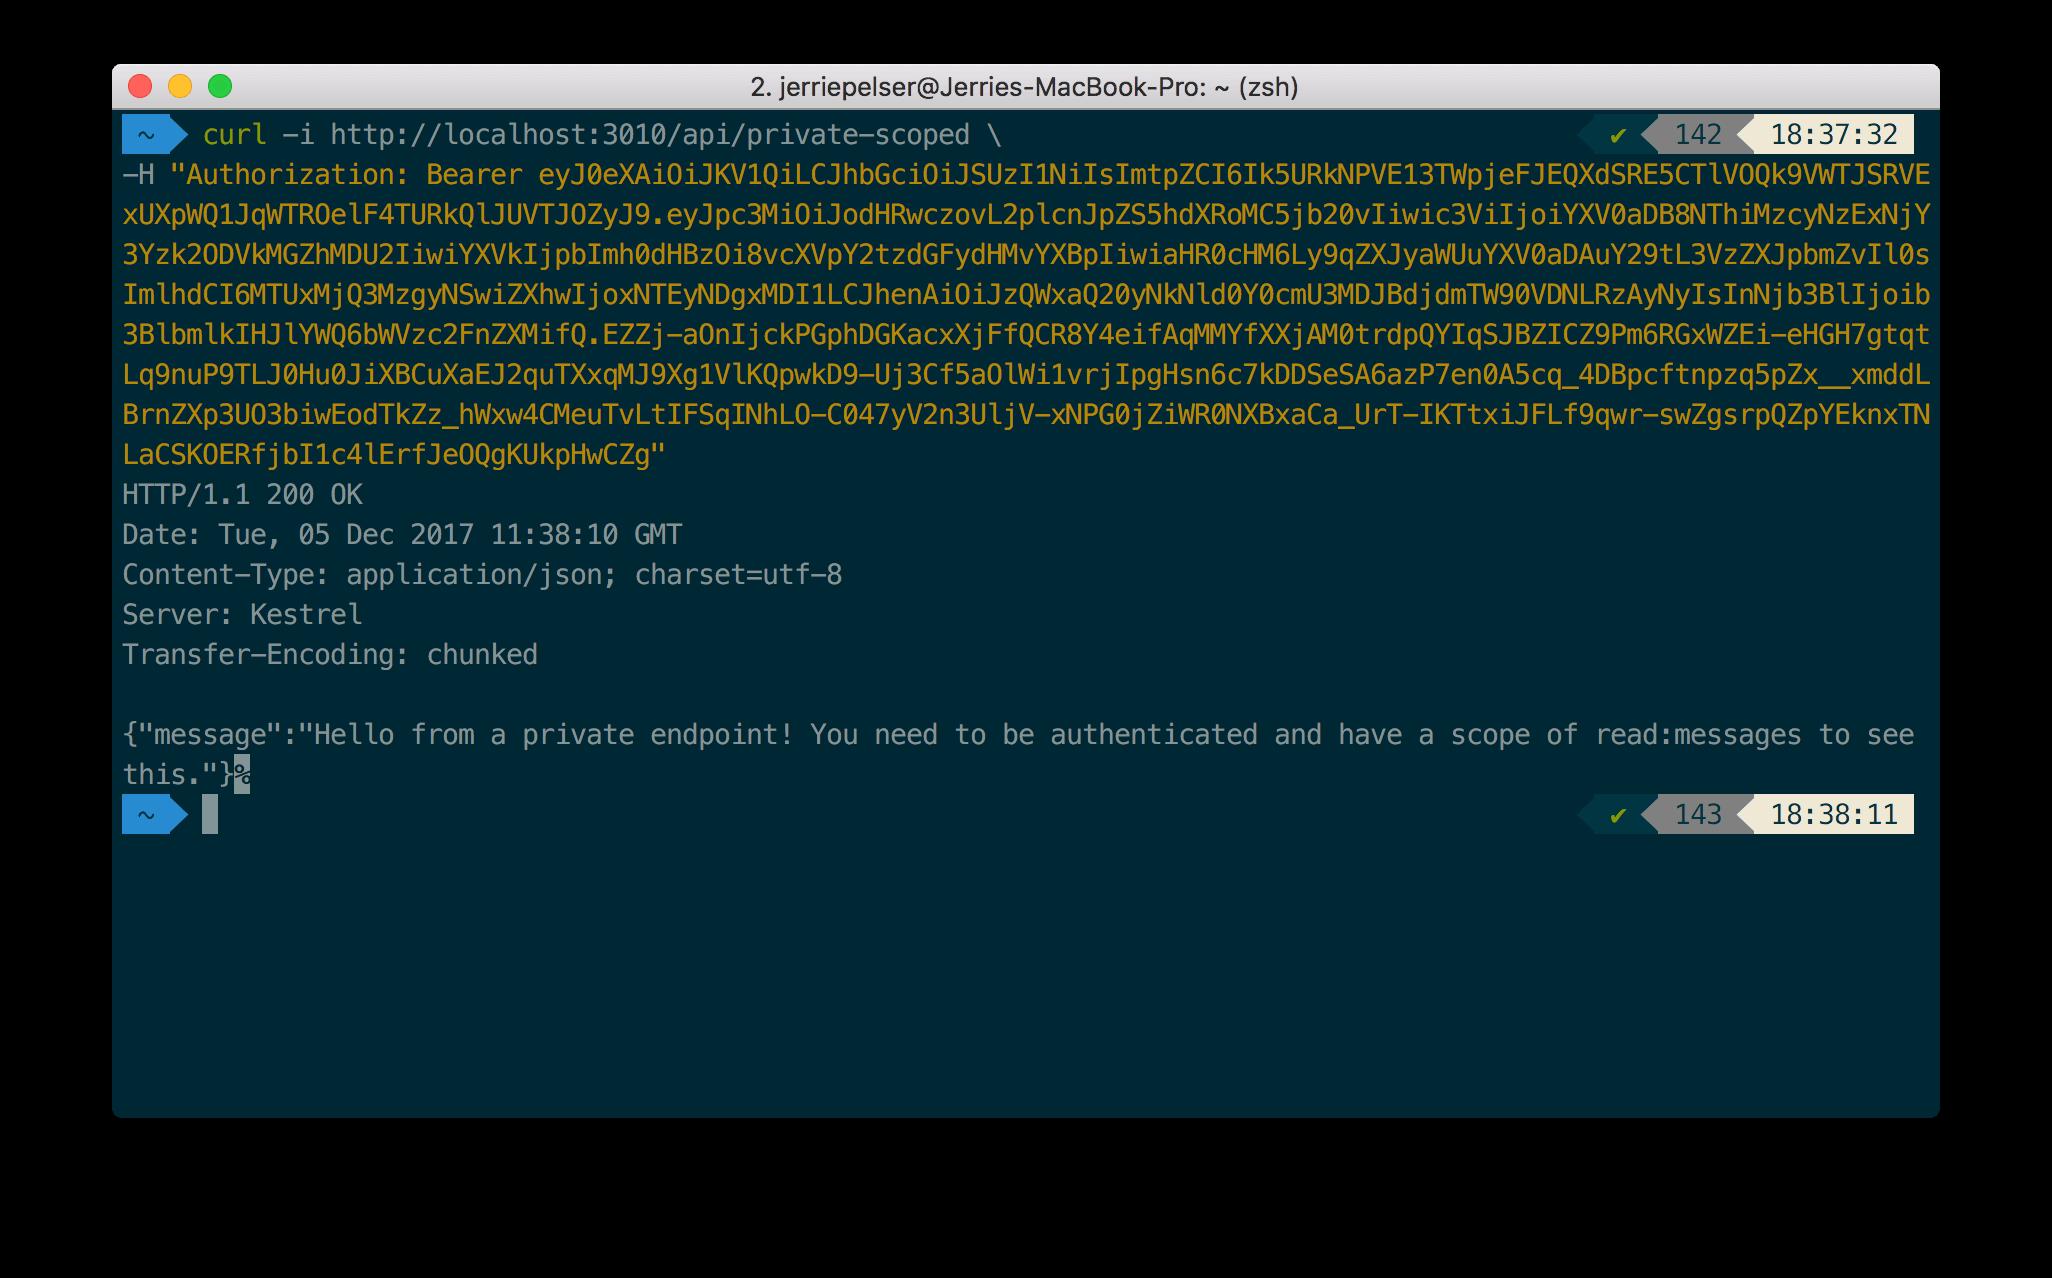 Response for scoped API request